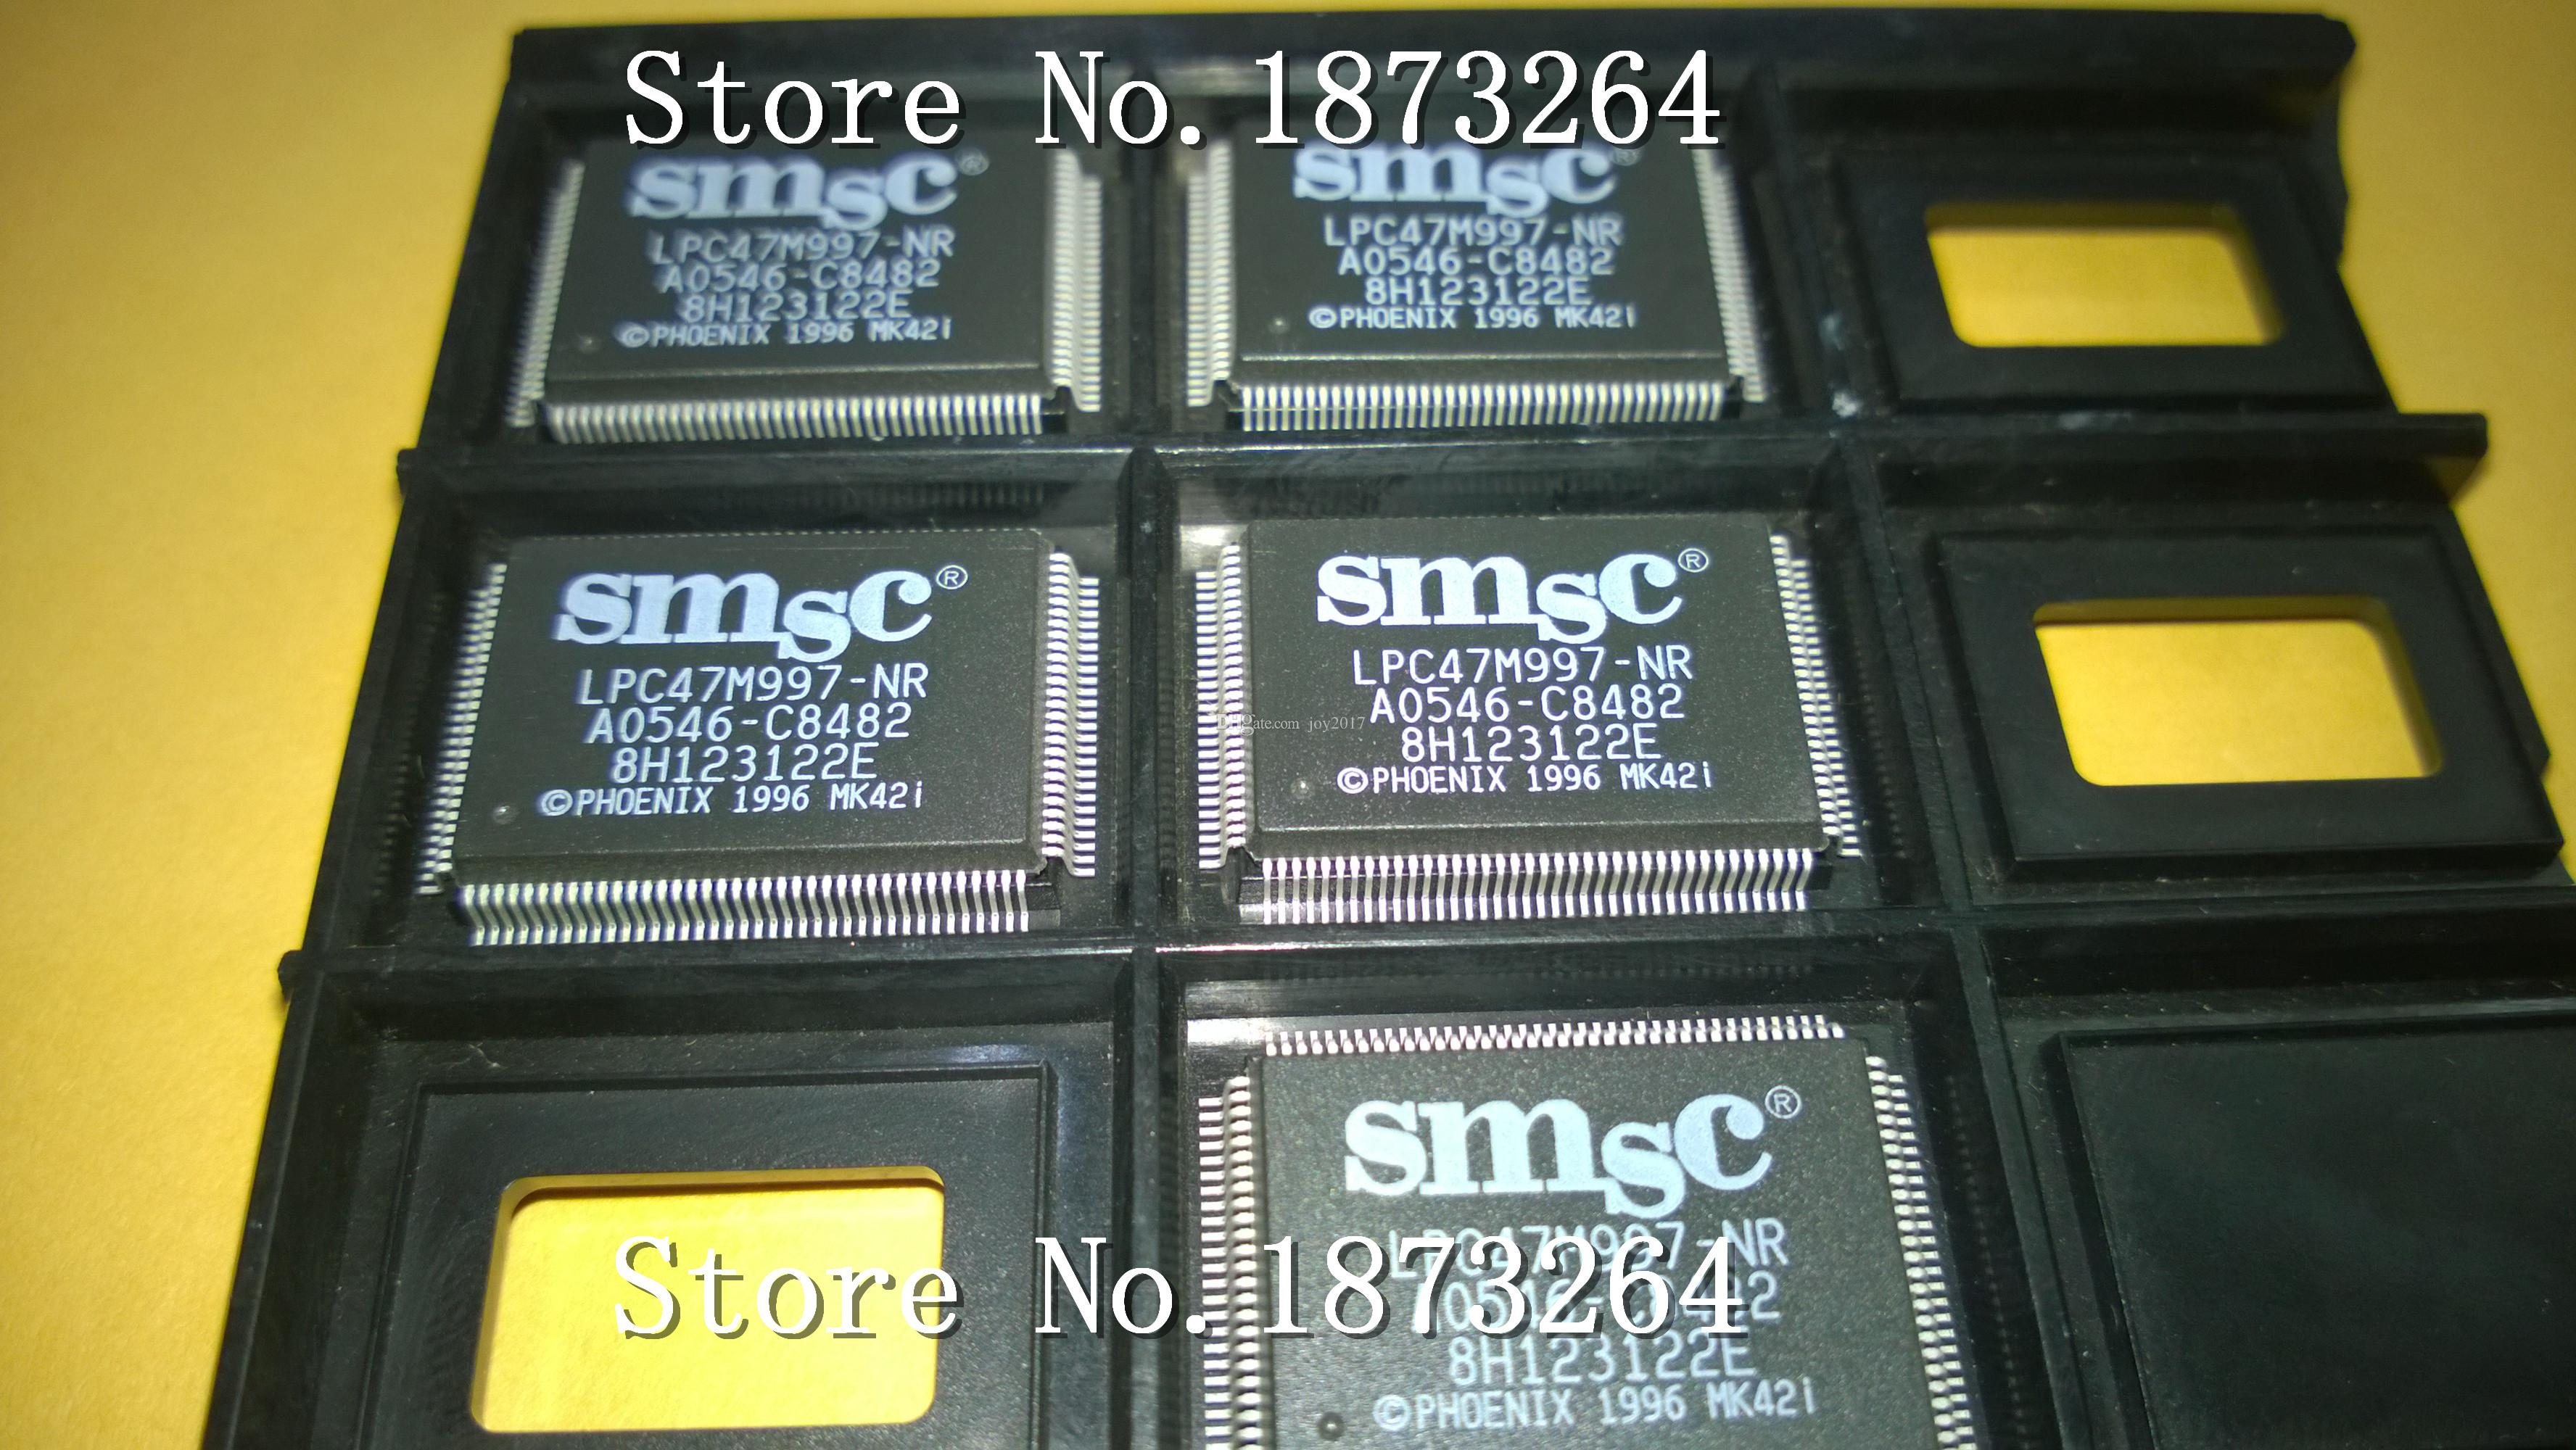 Ücretsiz Kargo LPC47M997-NR LPC47M997 QFP128 yeni orijinal 5 ADET / GRUP